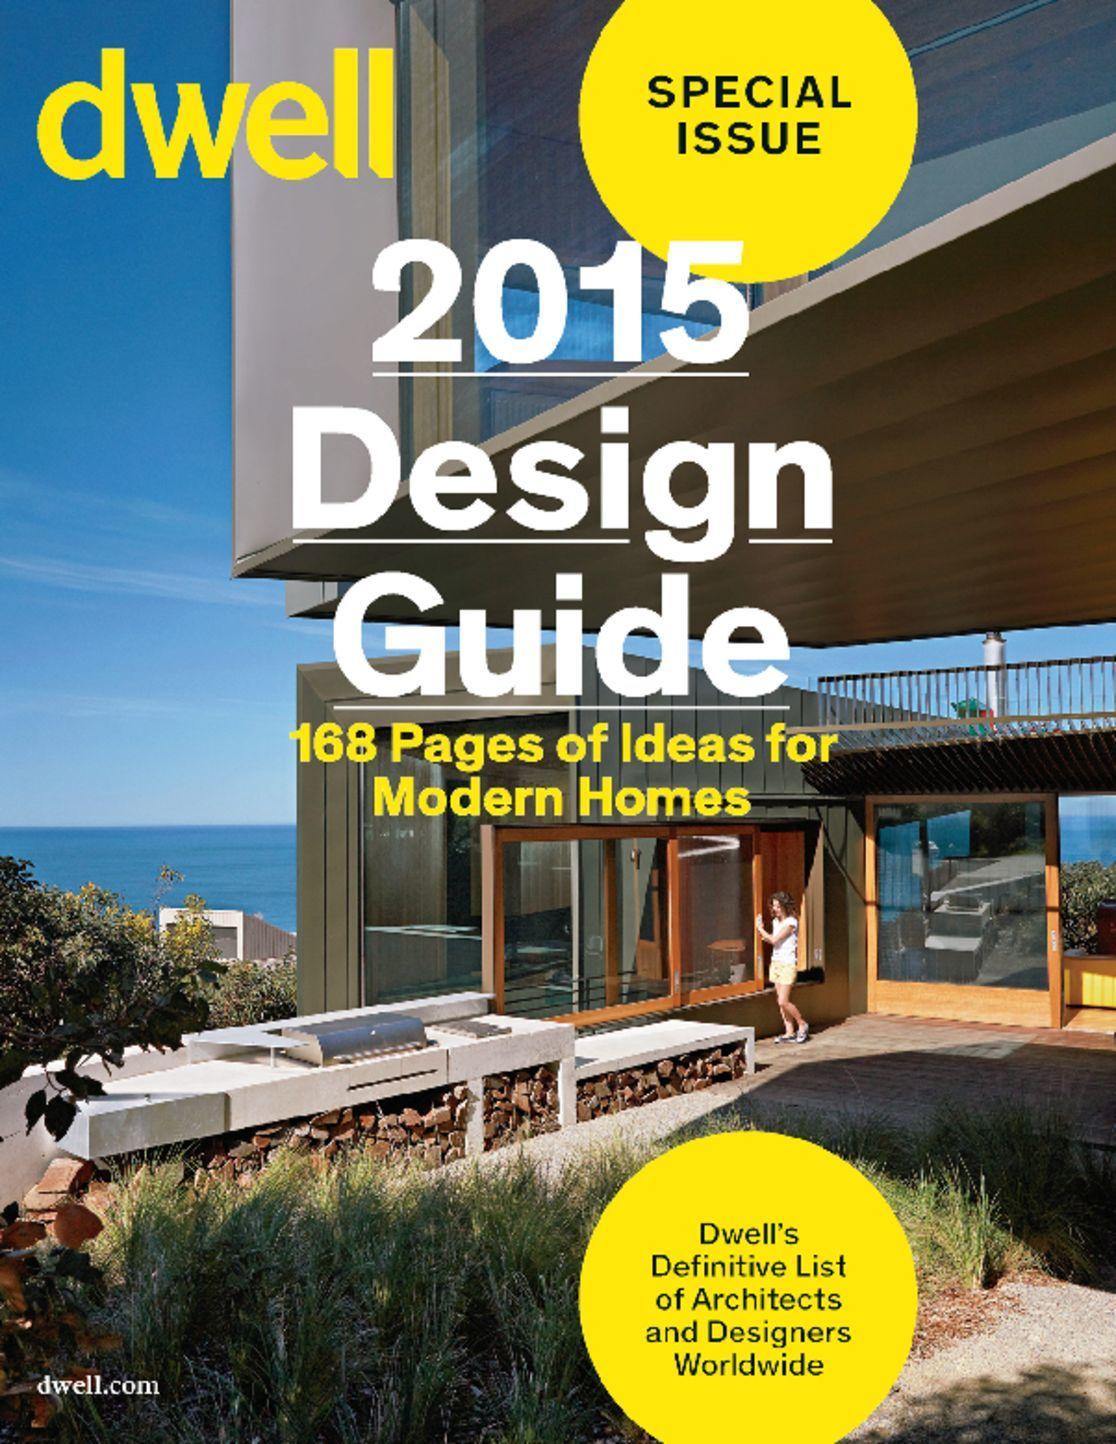 Dwell 2015 Design Guide Digital